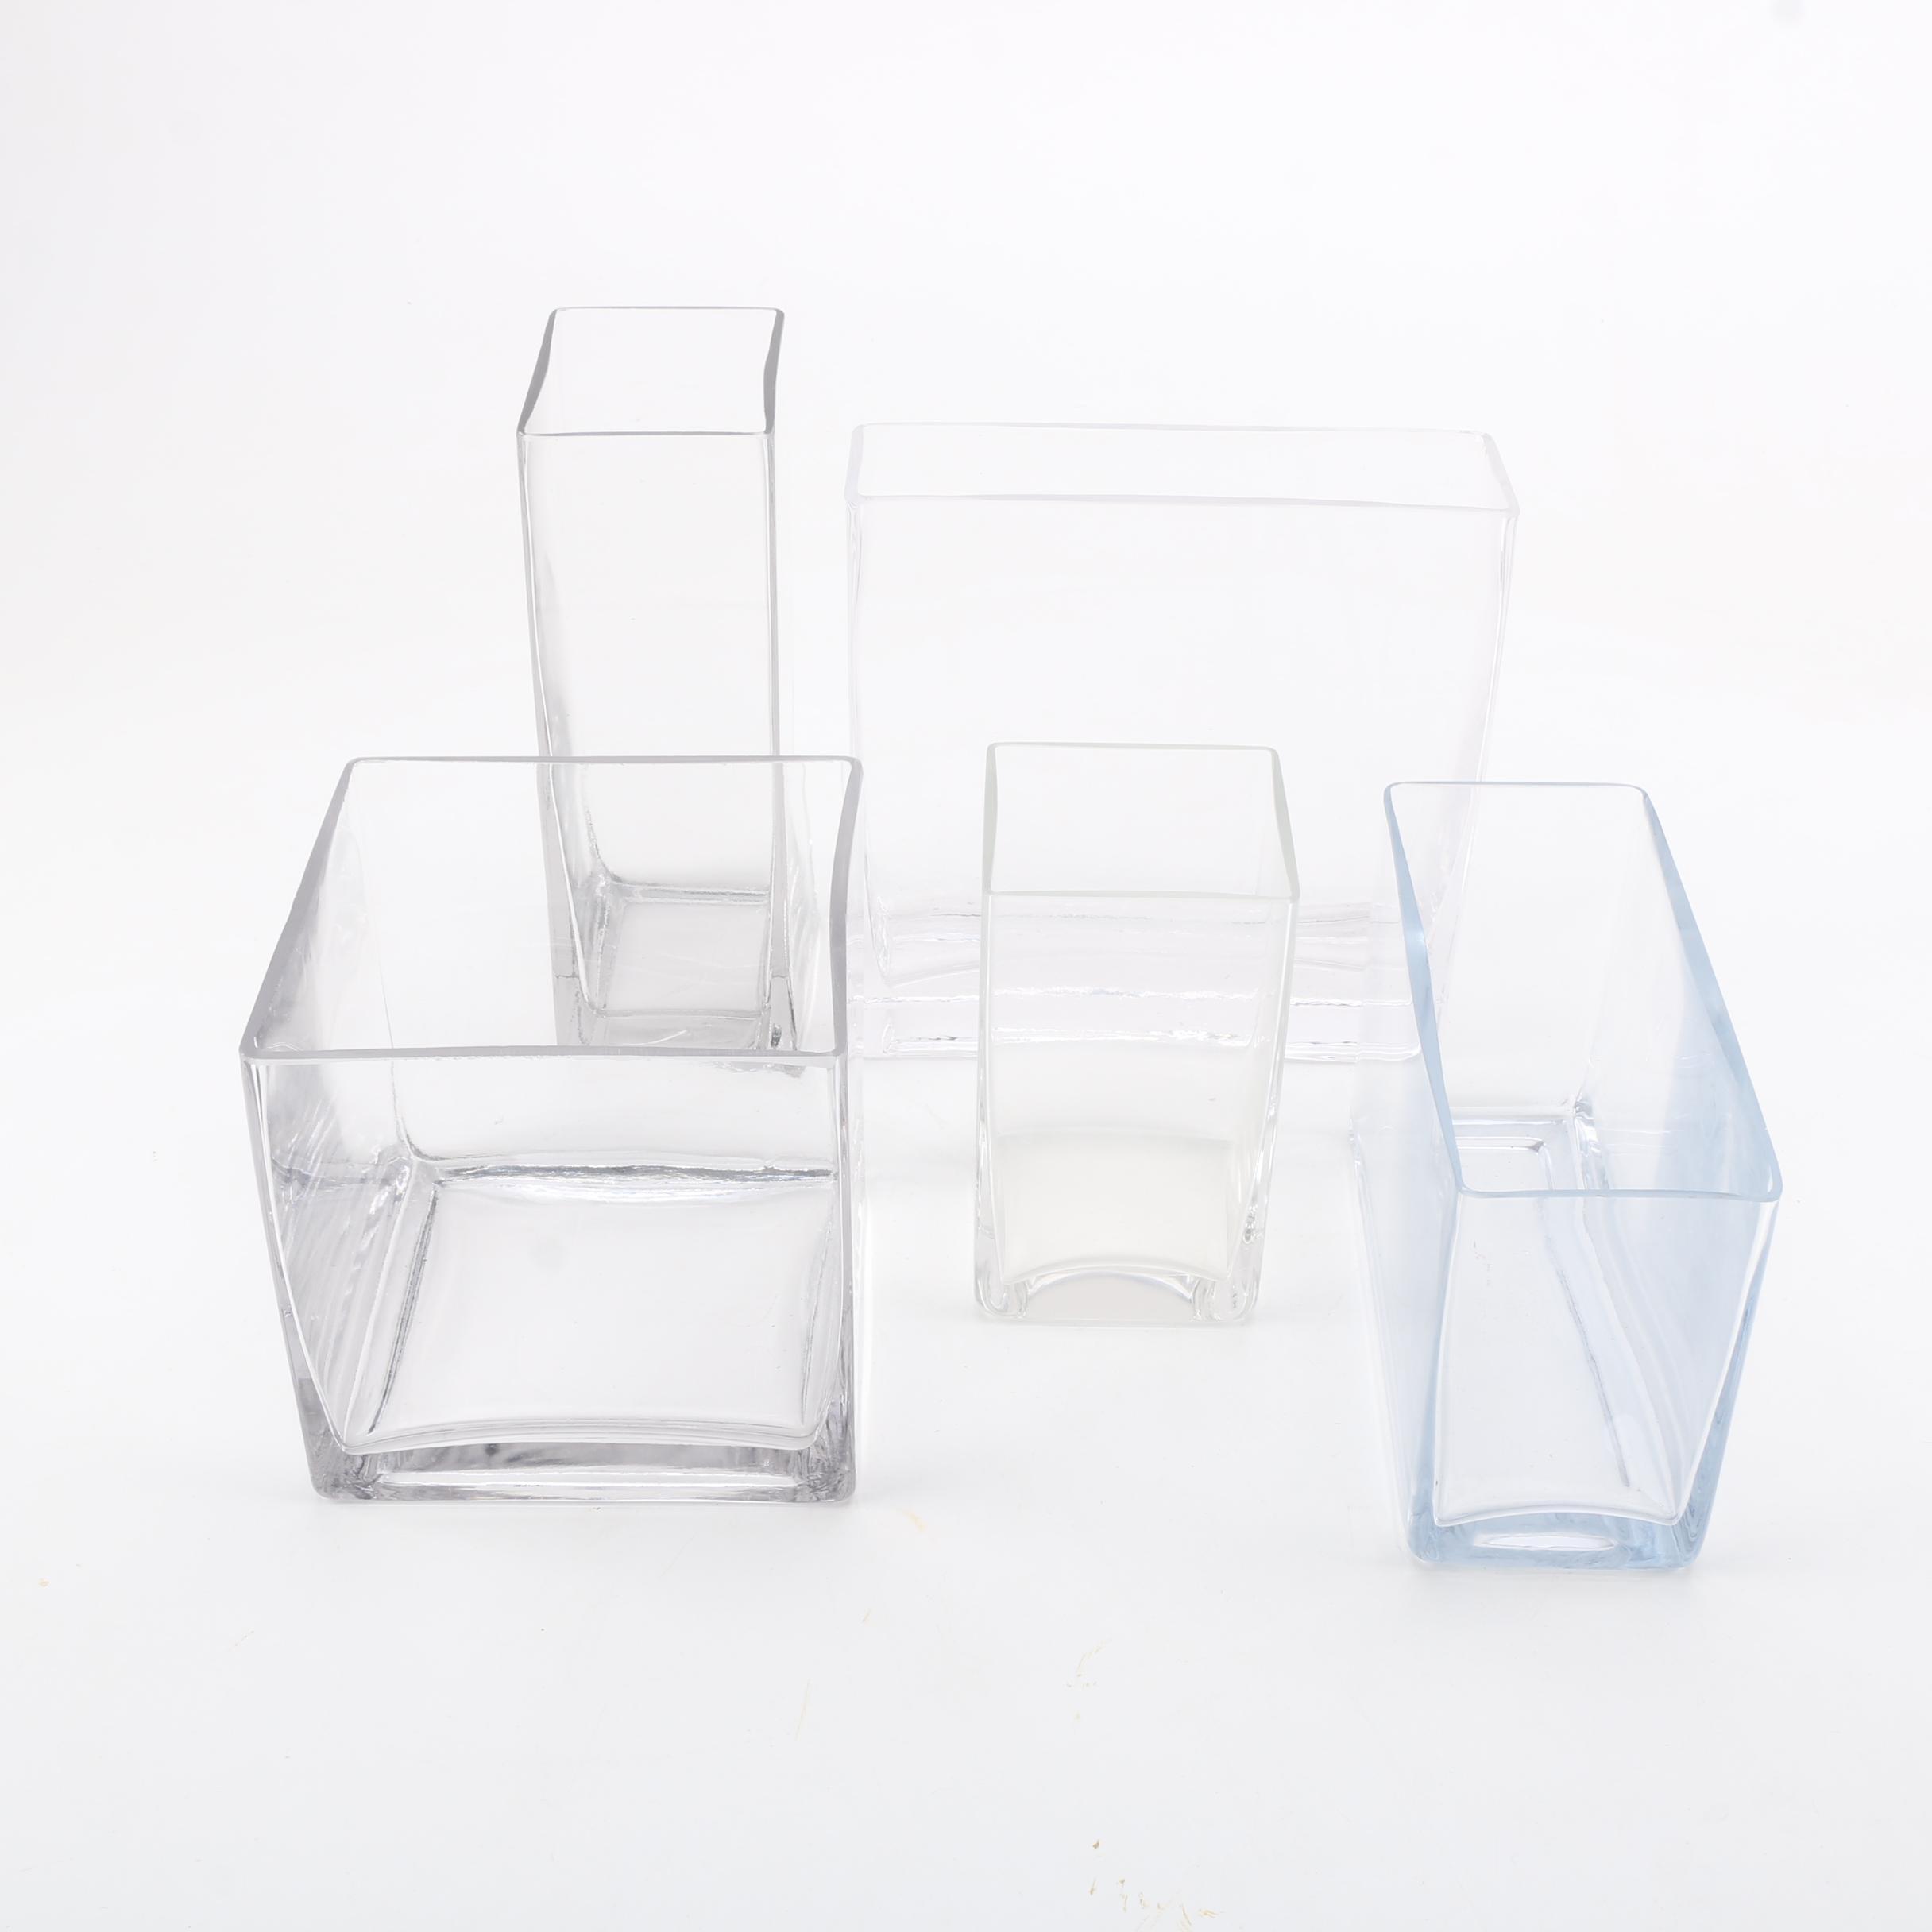 Contemporary Square Glass Vases